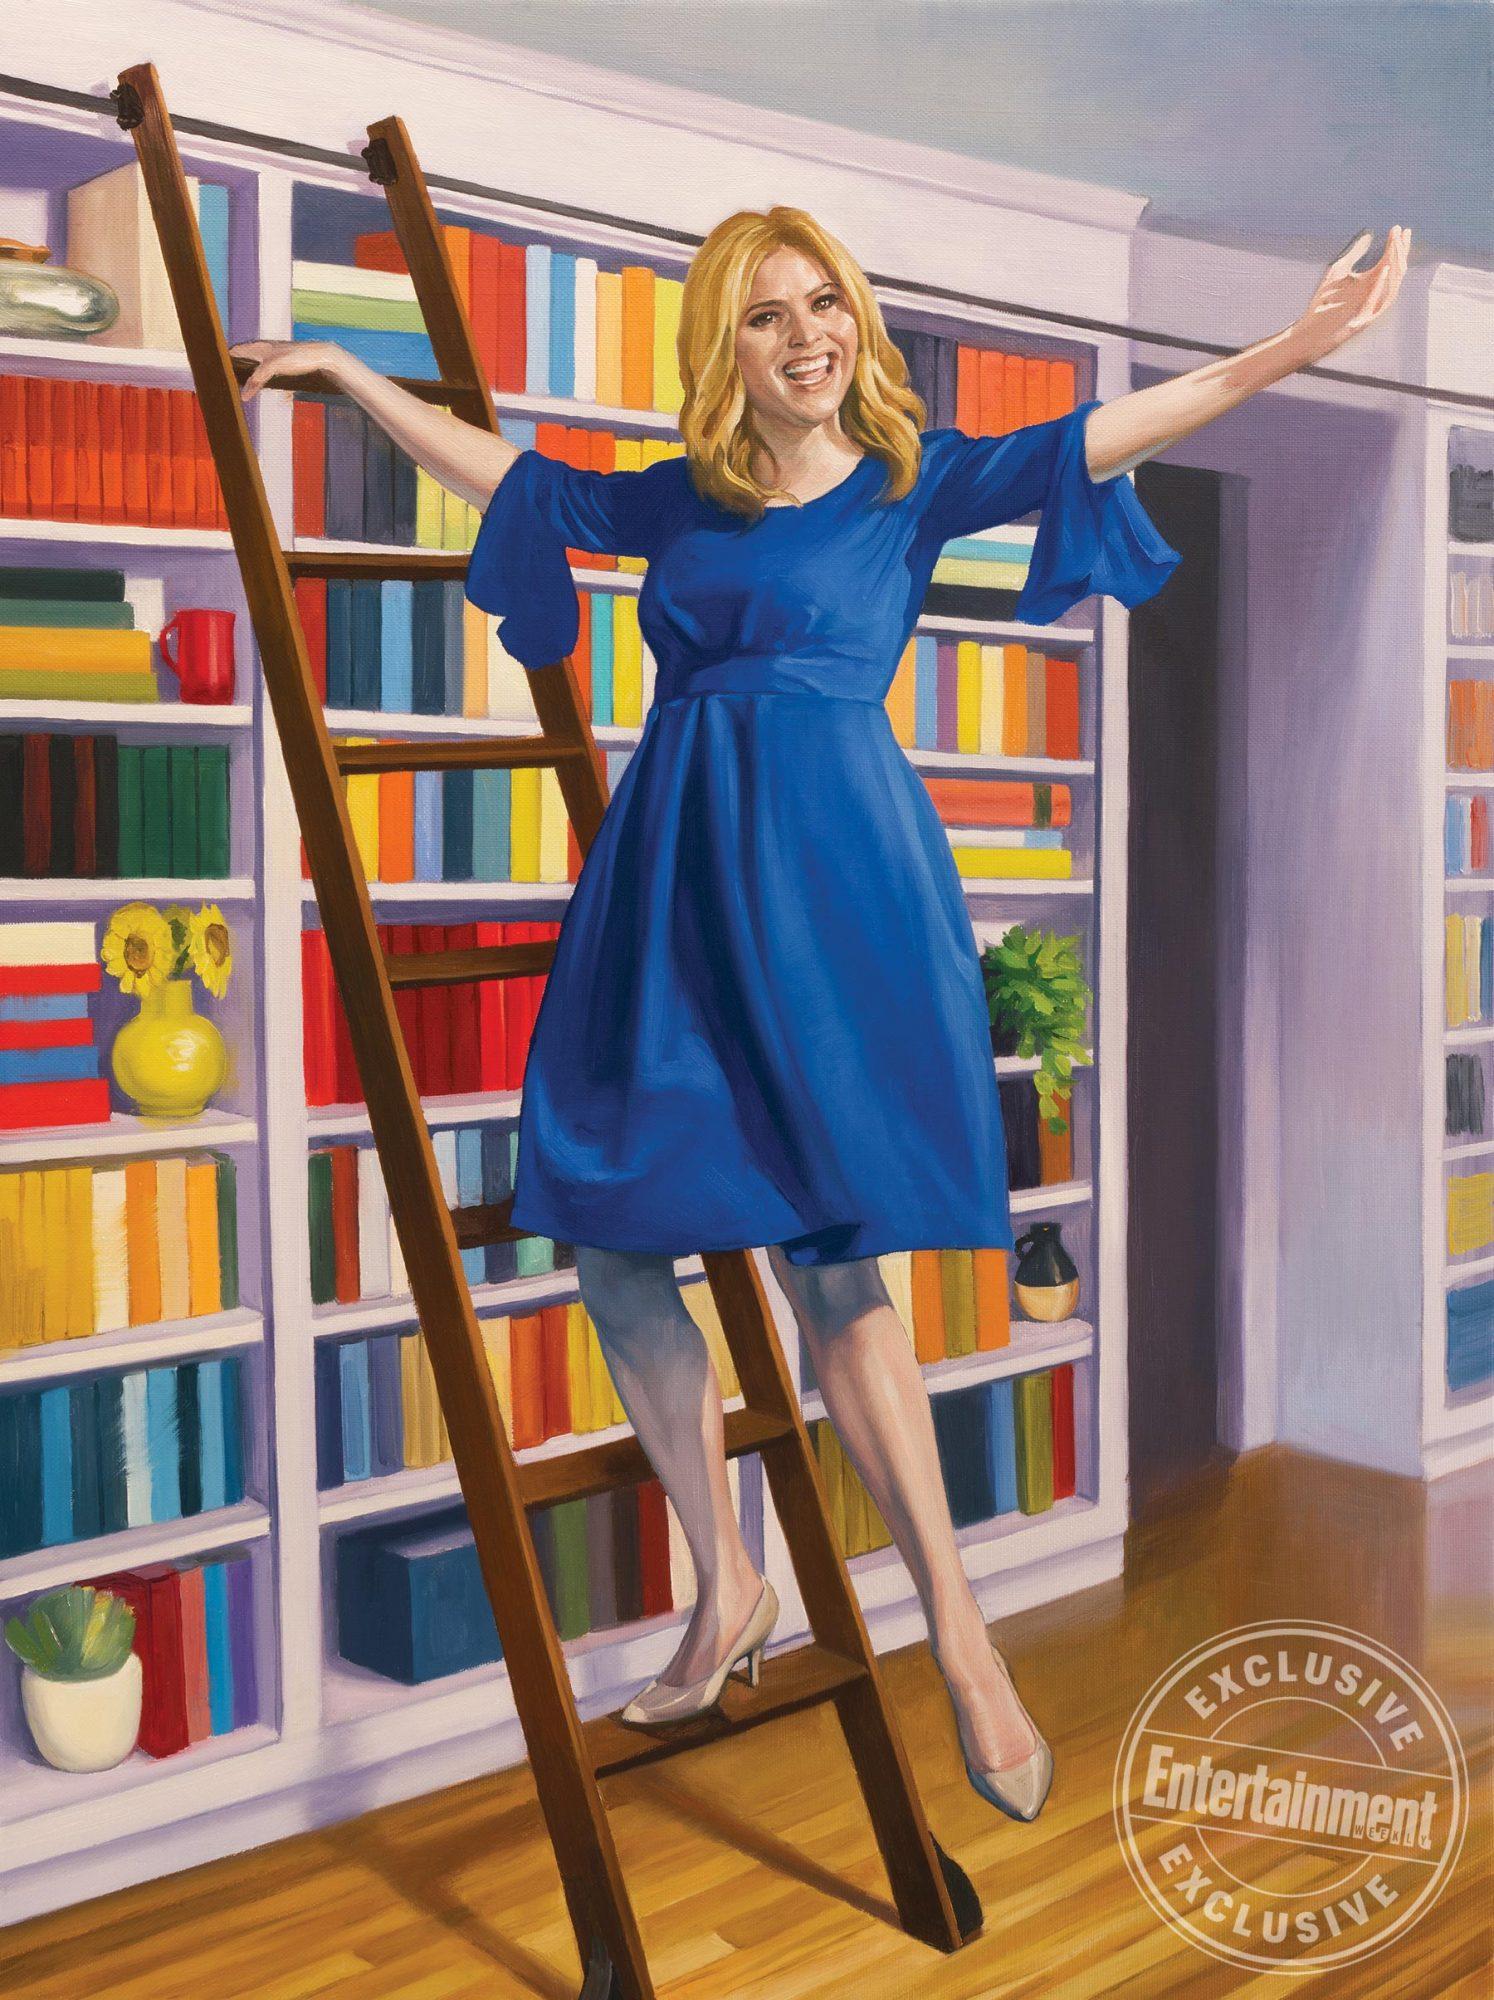 1568 Book Club Jenna Bush Hager by Roberto Parada CR: Illustration by Roberto Parada for EW